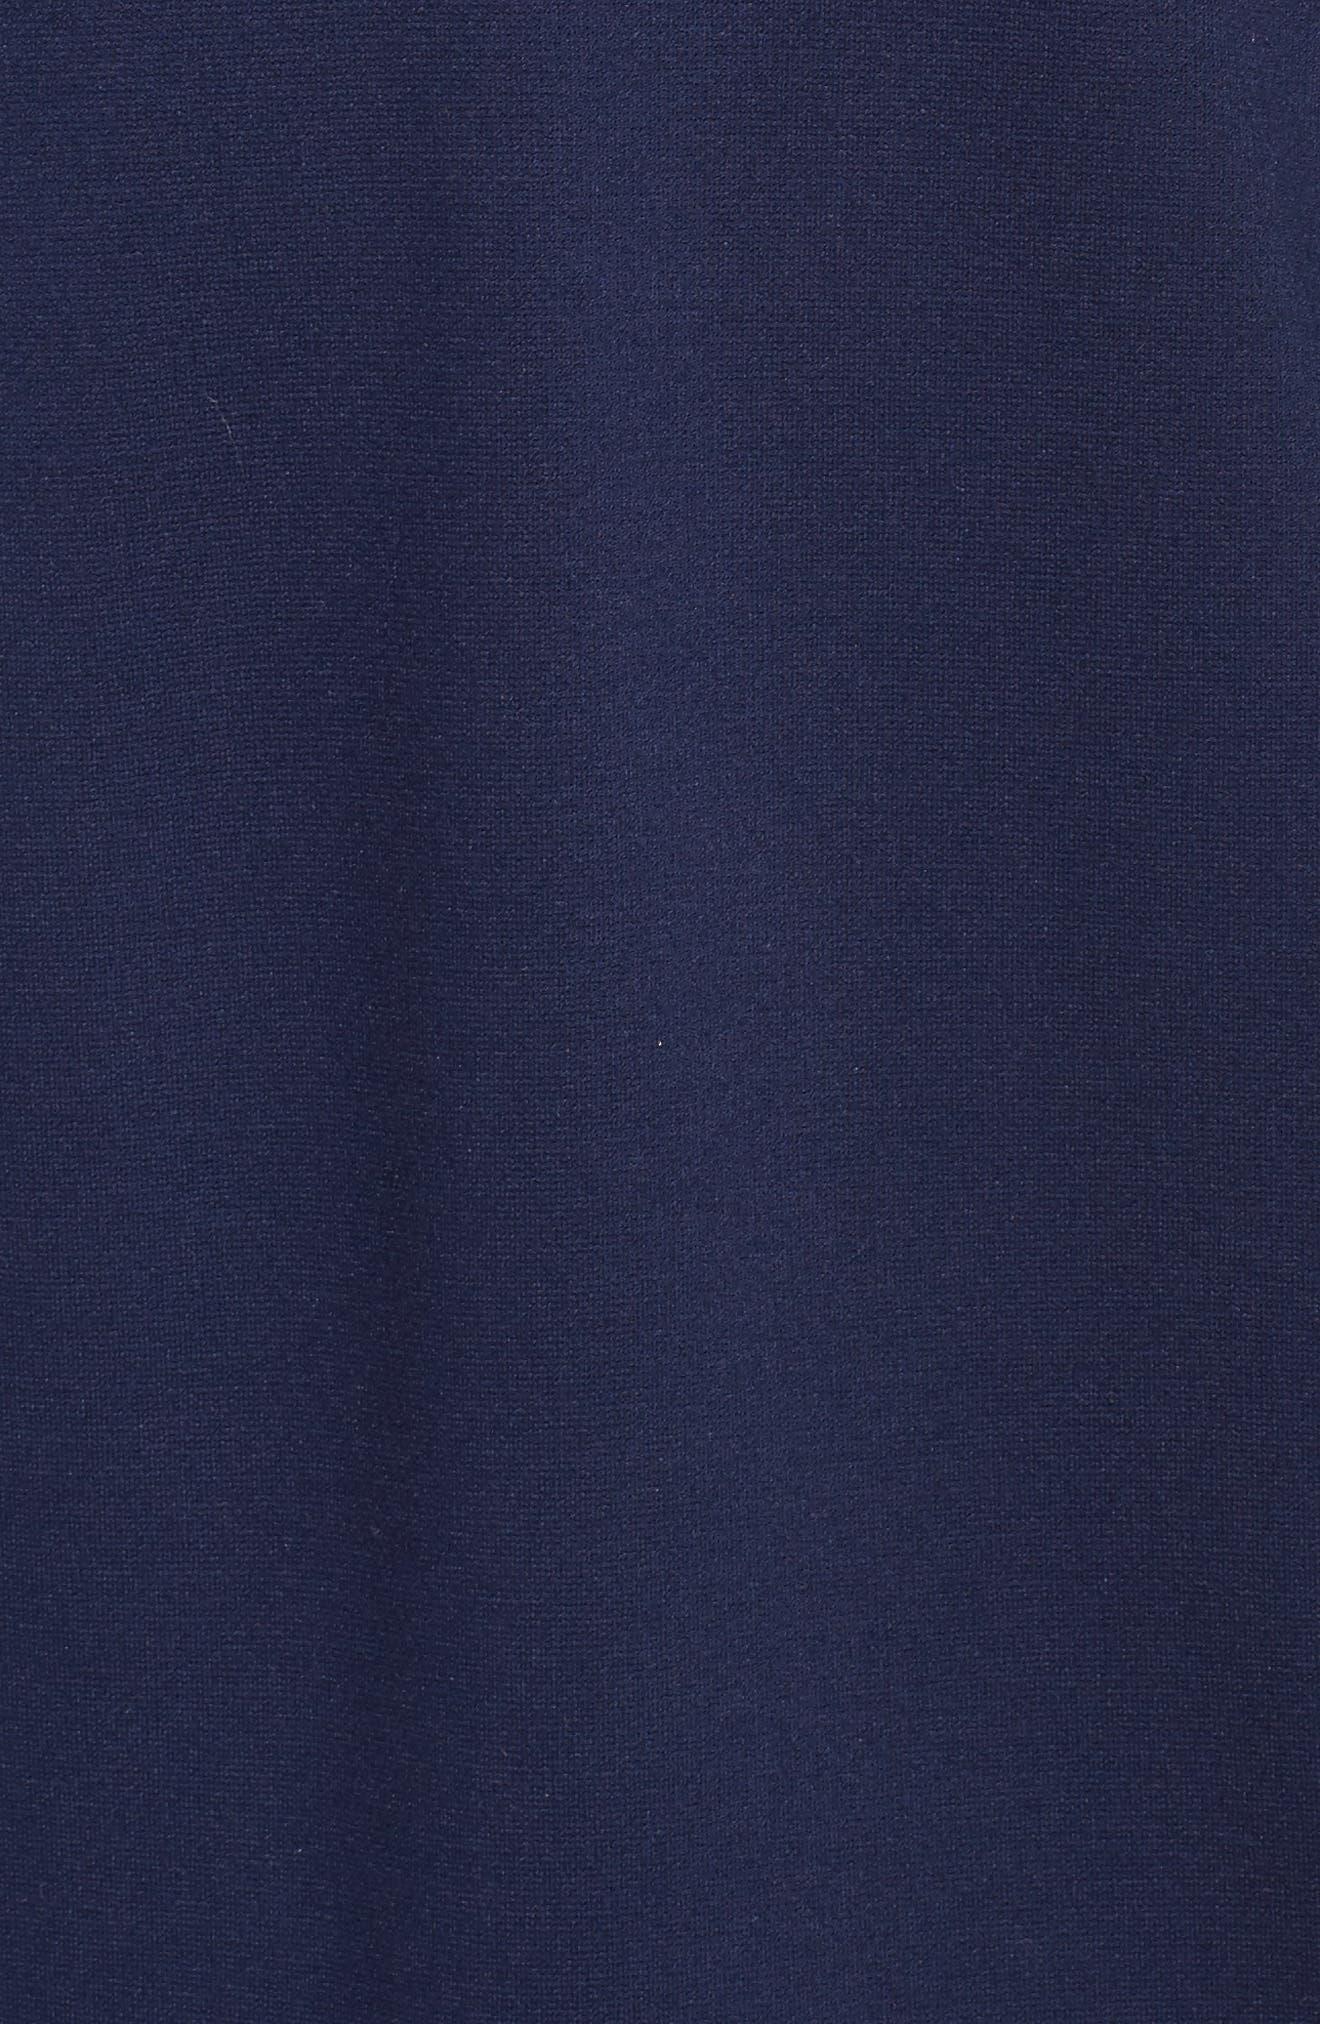 ELIZA J, Embroidered Ponte Sheath Dress, Alternate thumbnail 6, color, 410